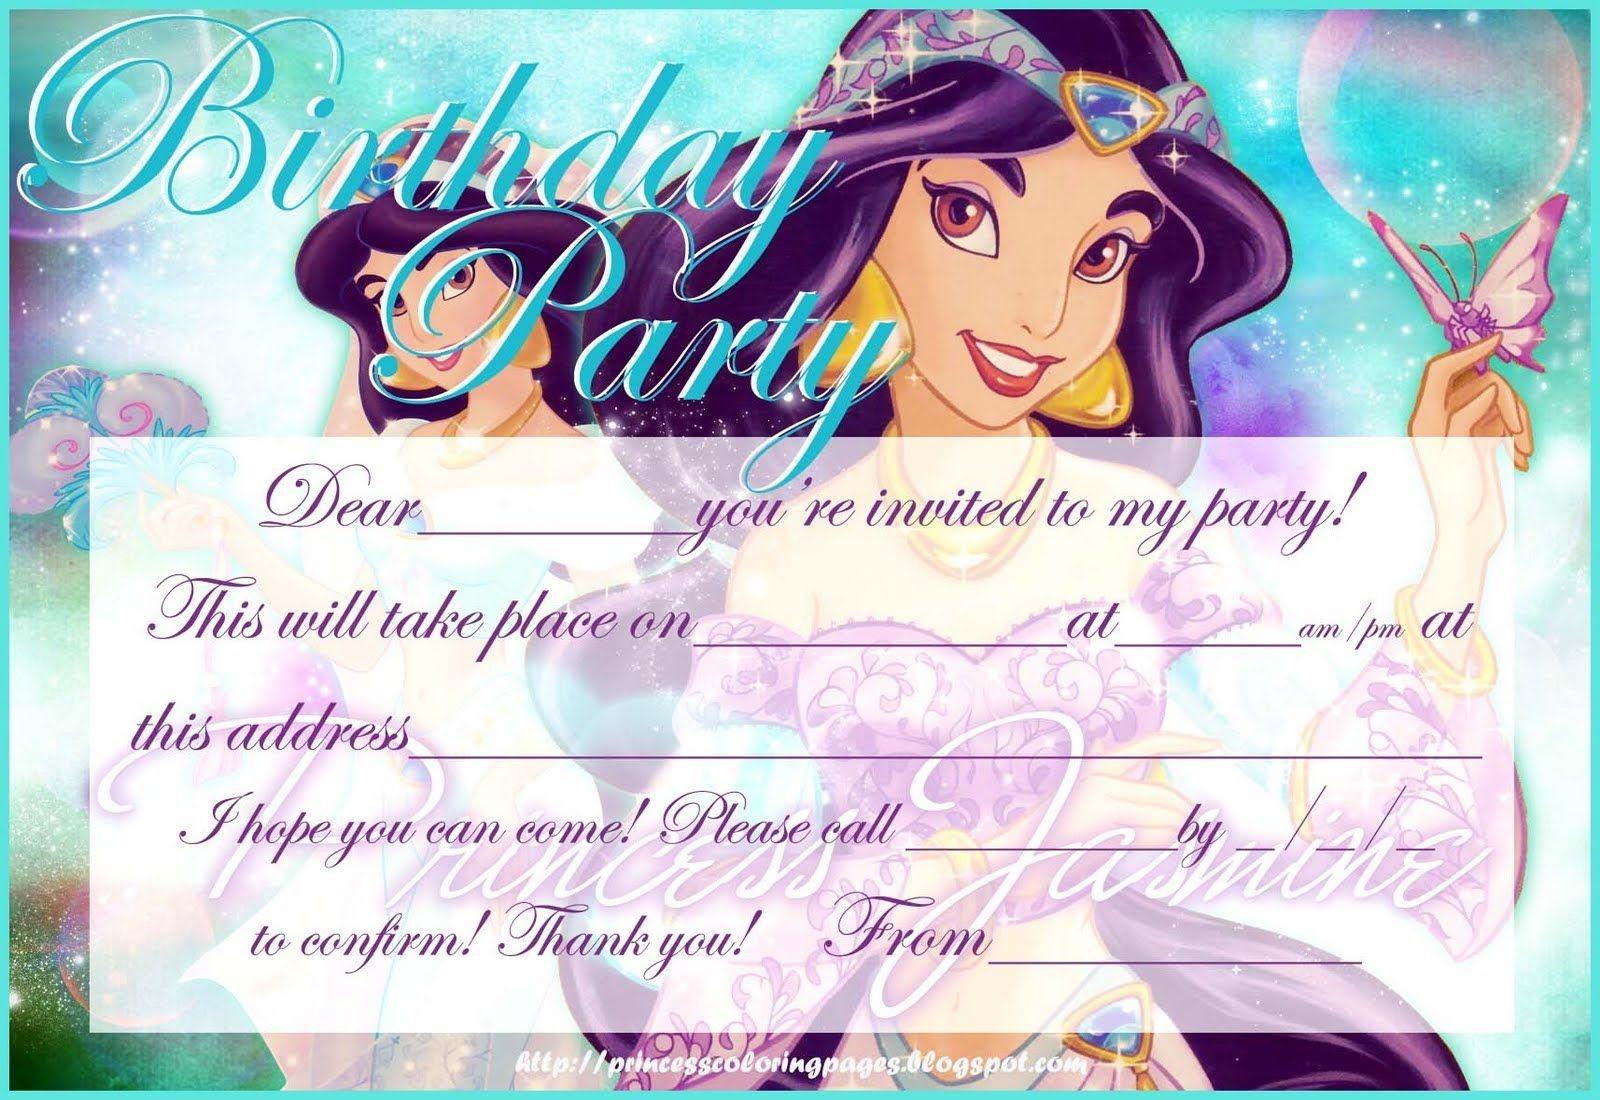 Hundreds Of Free, Printable Princess Coloring Pages, Princess Party - Free Printable Princess Jasmine Invitations